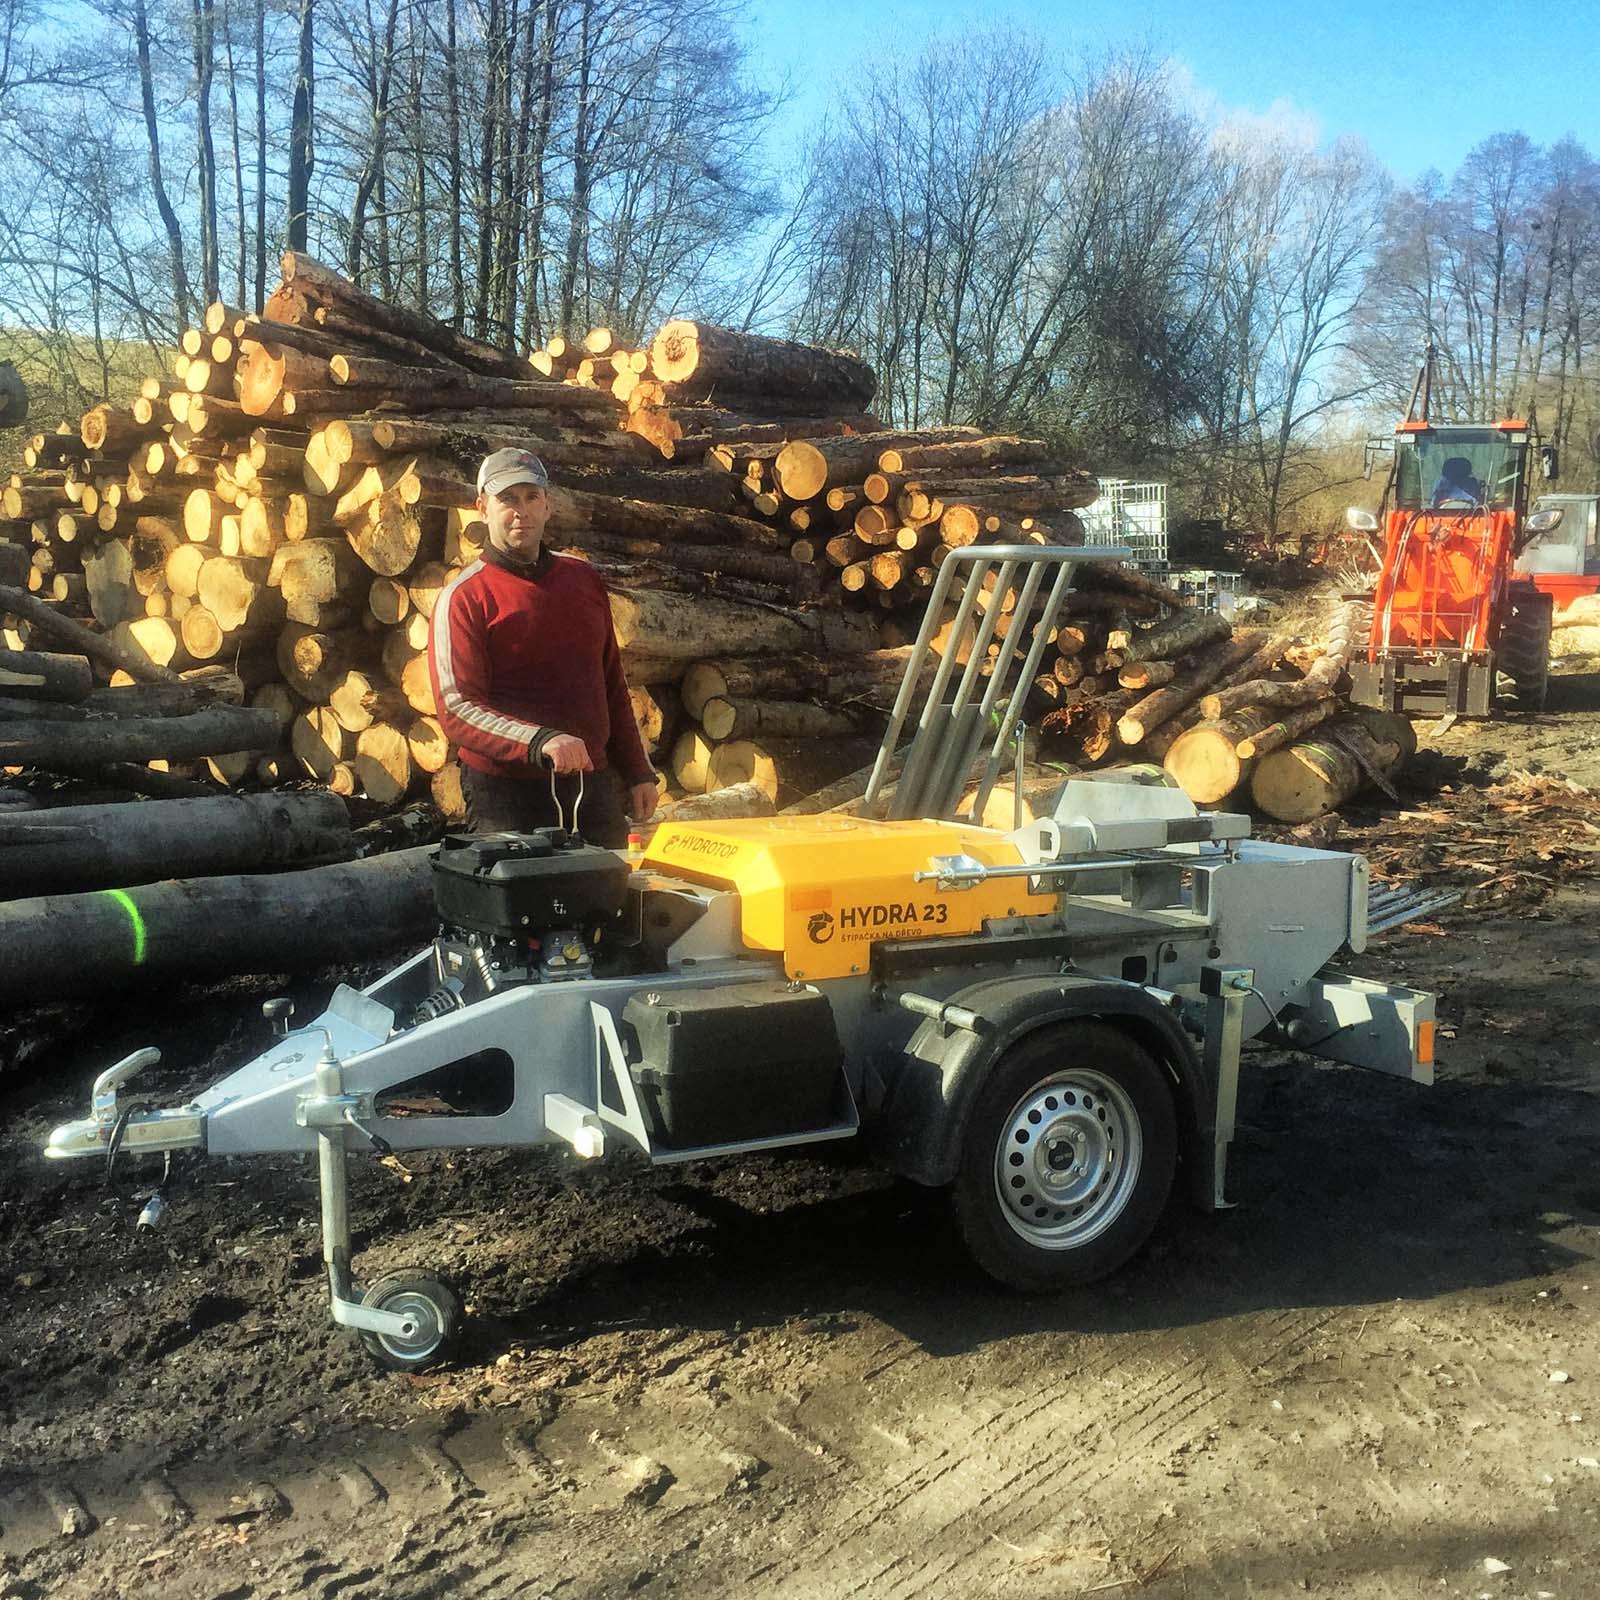 Roman Šofranko štípač dřeva s benzinovým motorem